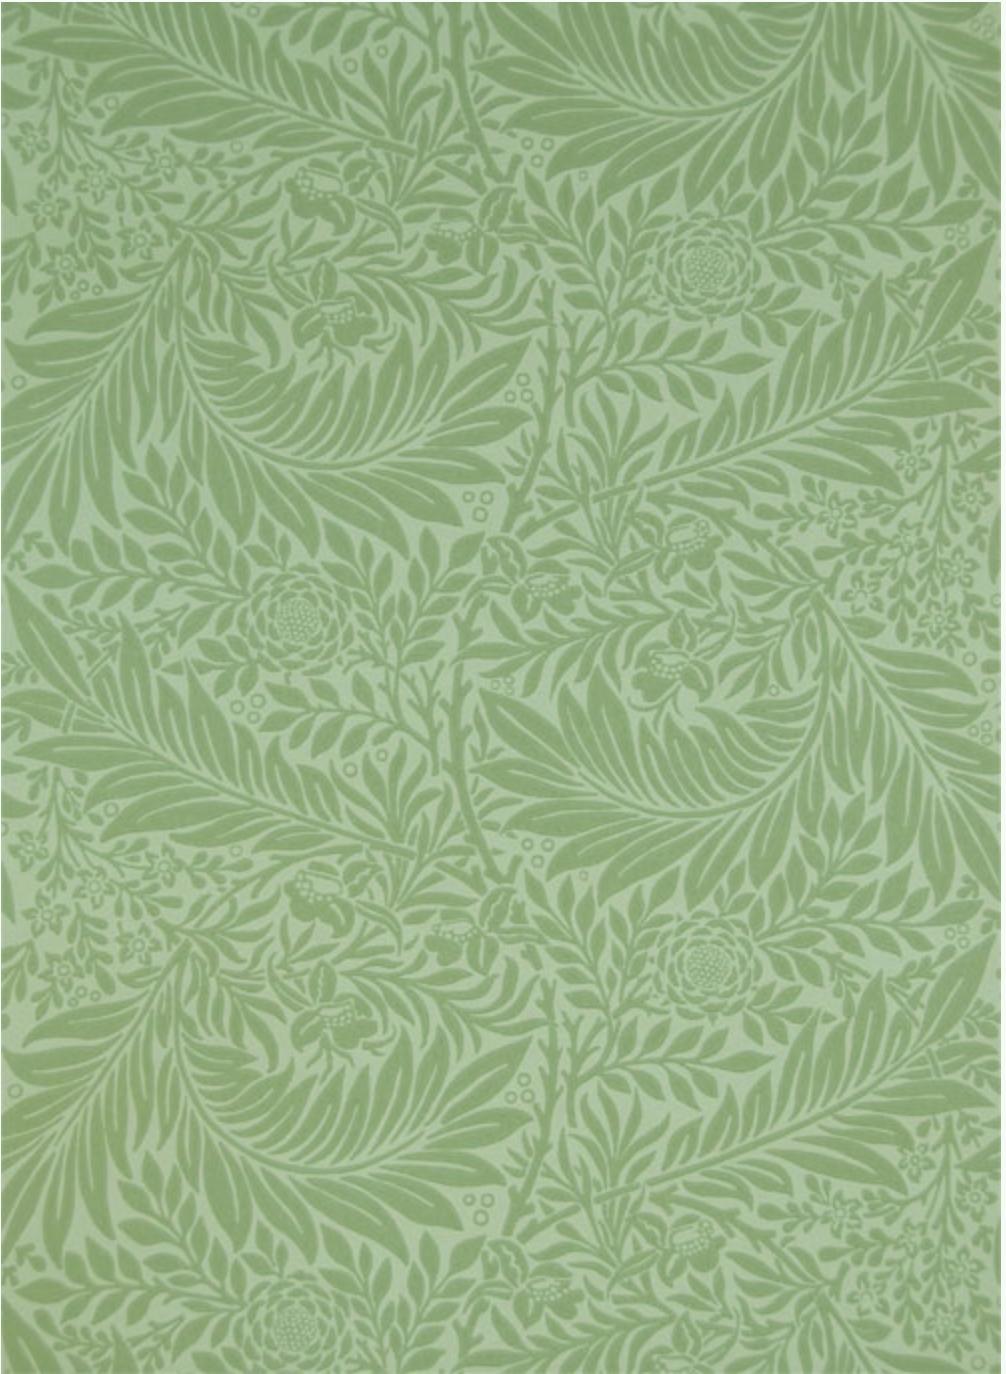 Larkspur wallpaper, designed by Morris in 1872.